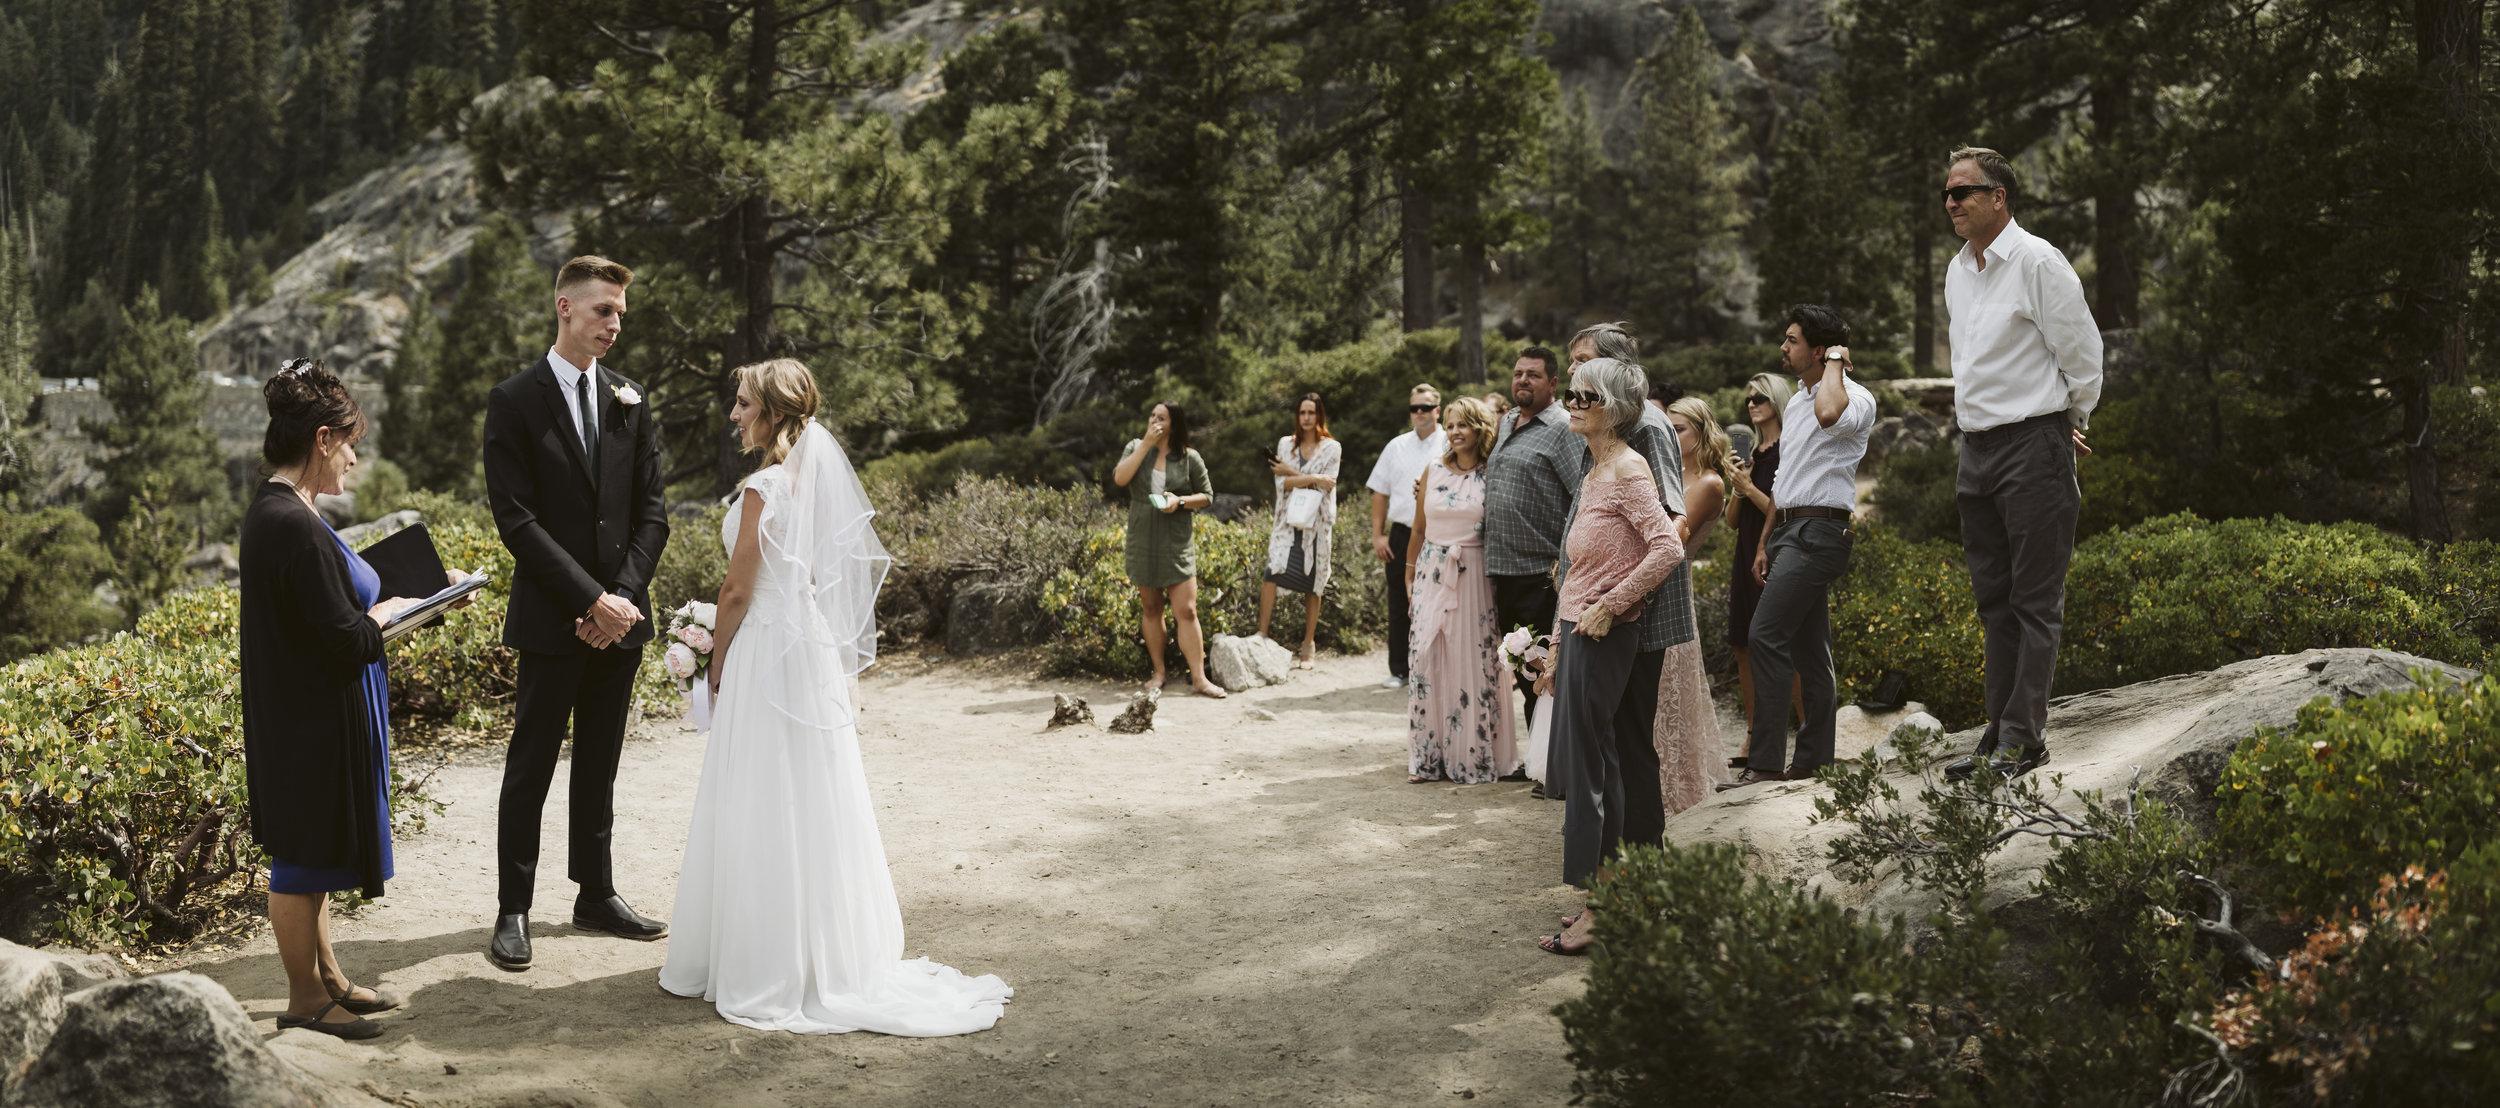 0M7A0722-Panovildphotography-adventurewedding-adventurouswedding-tahoewedding-laketahoewedding-adventureelopement-laketahoeweddingphotographer-wedding-photographer-weddingphotographer-Chase-Sam.jpg